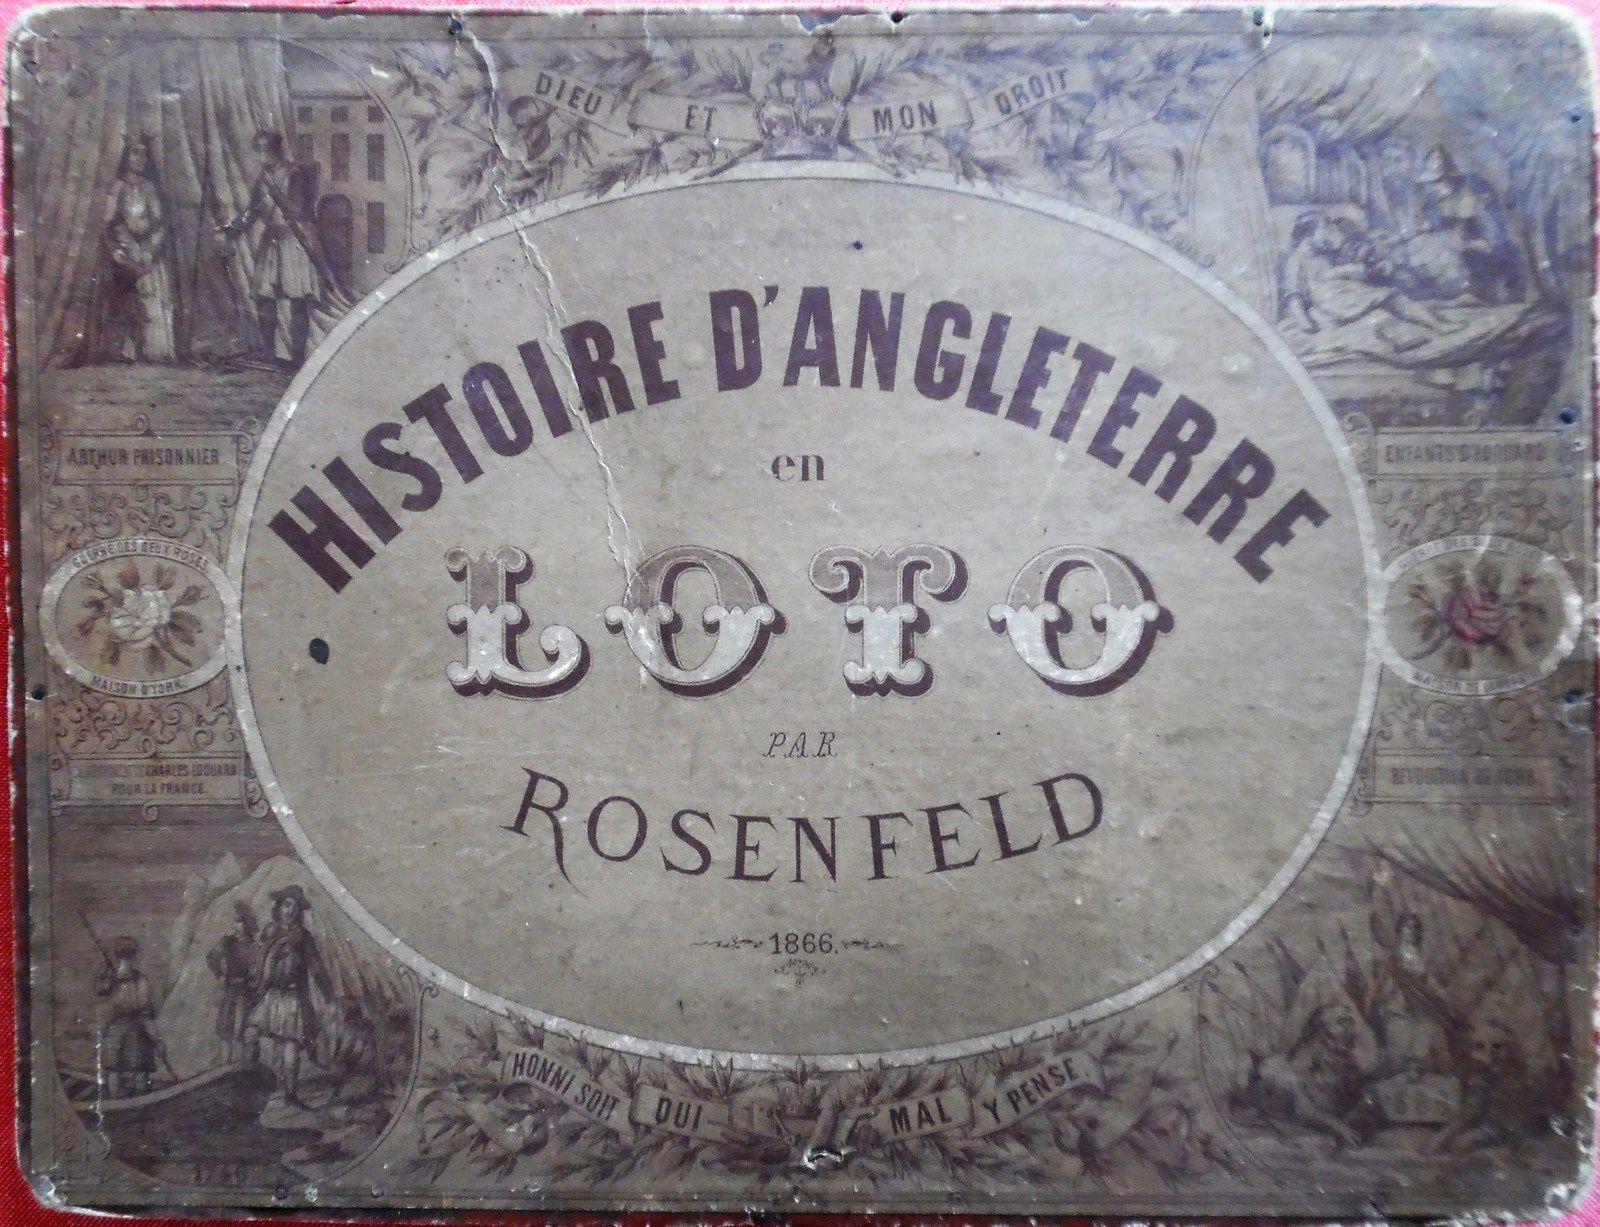 Histoire d'Angleterre, loto de Rosenfeld (1866)